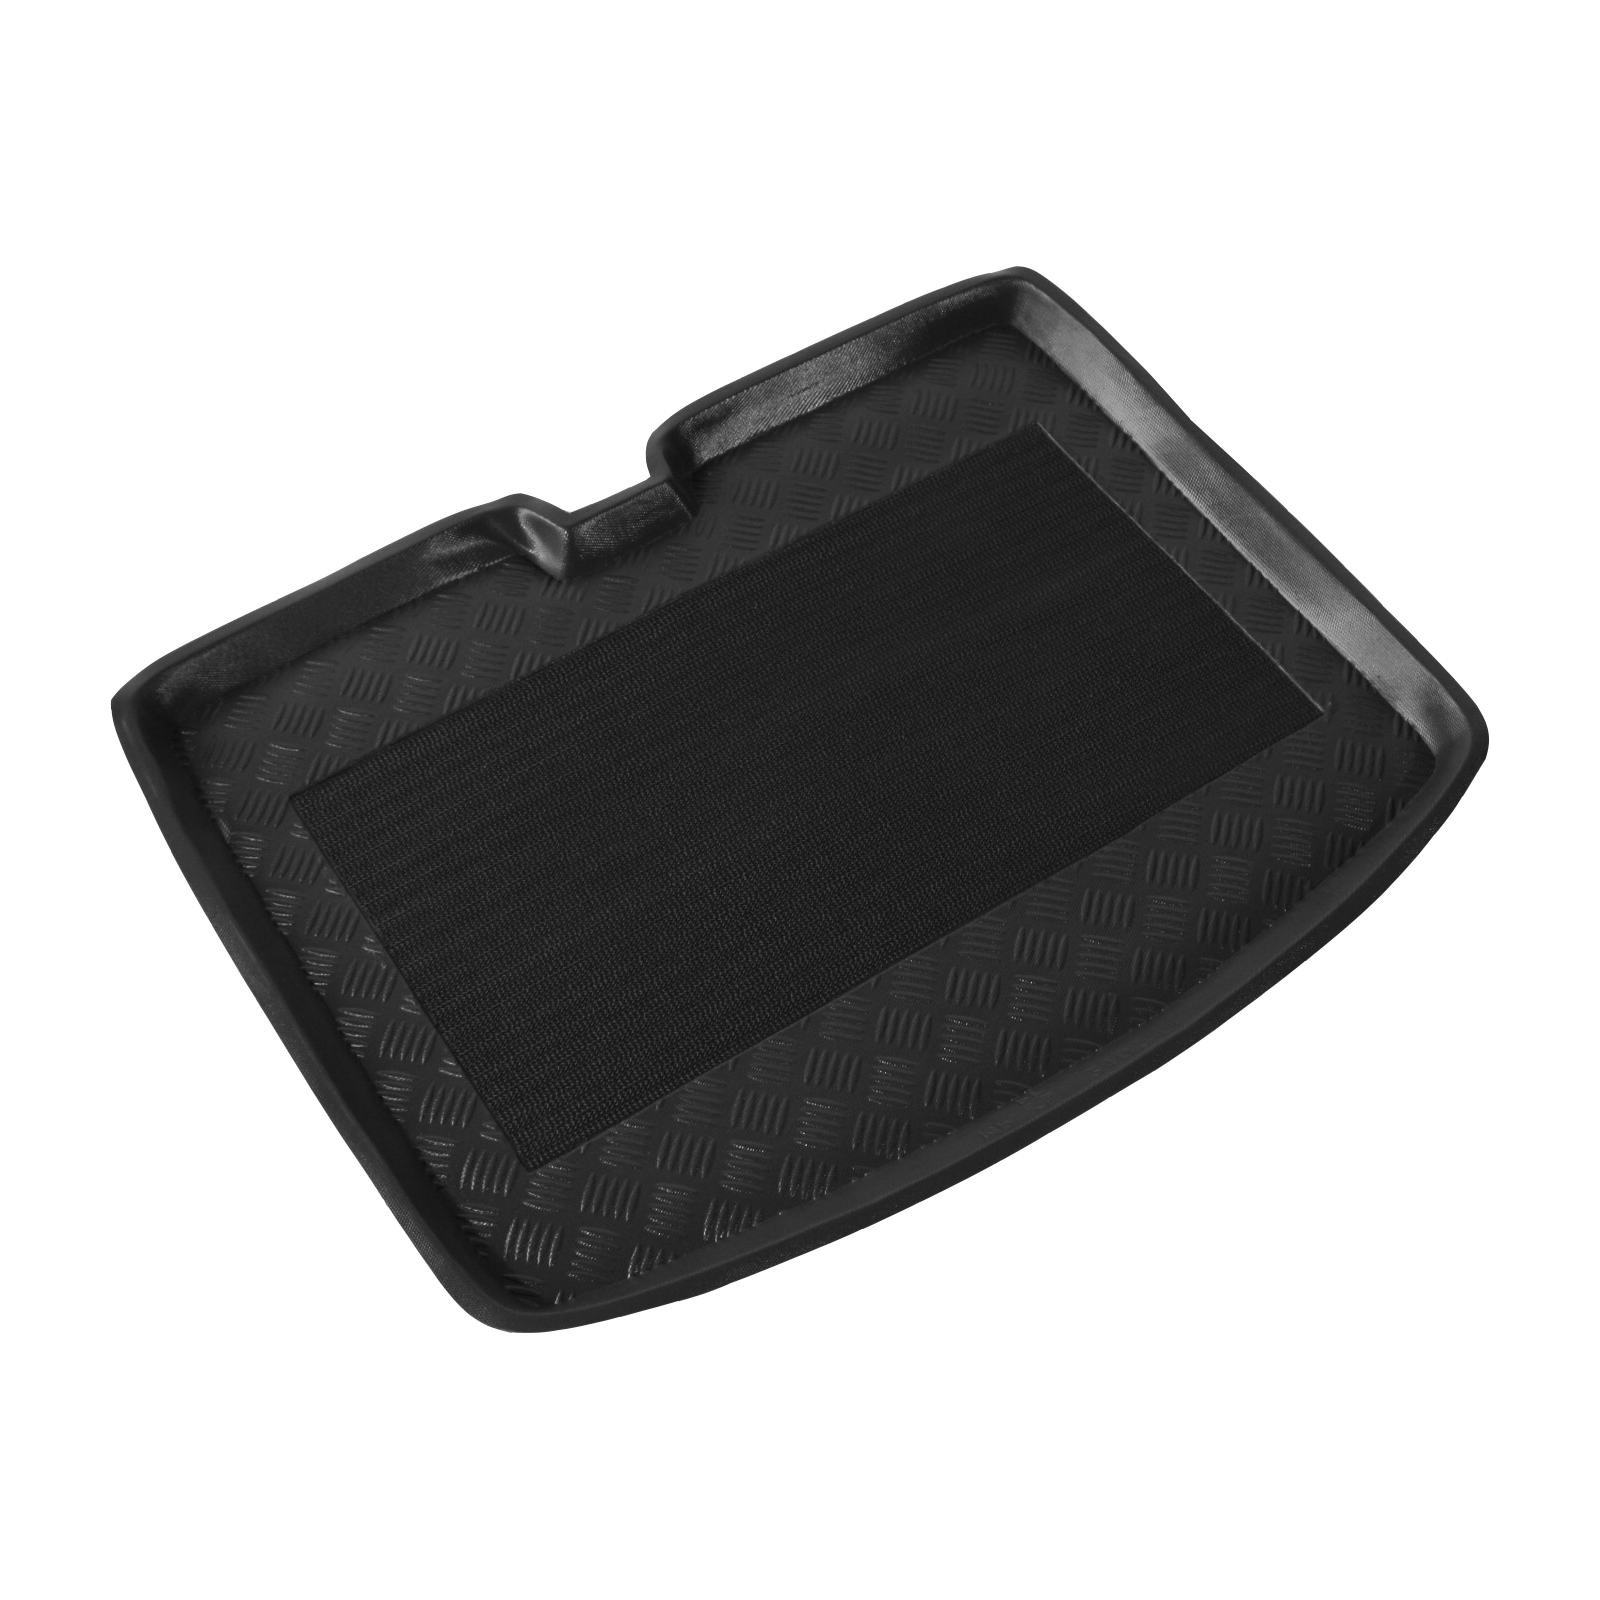 bac coffre noir pour volvo v40 3 5 portes bj. Black Bedroom Furniture Sets. Home Design Ideas